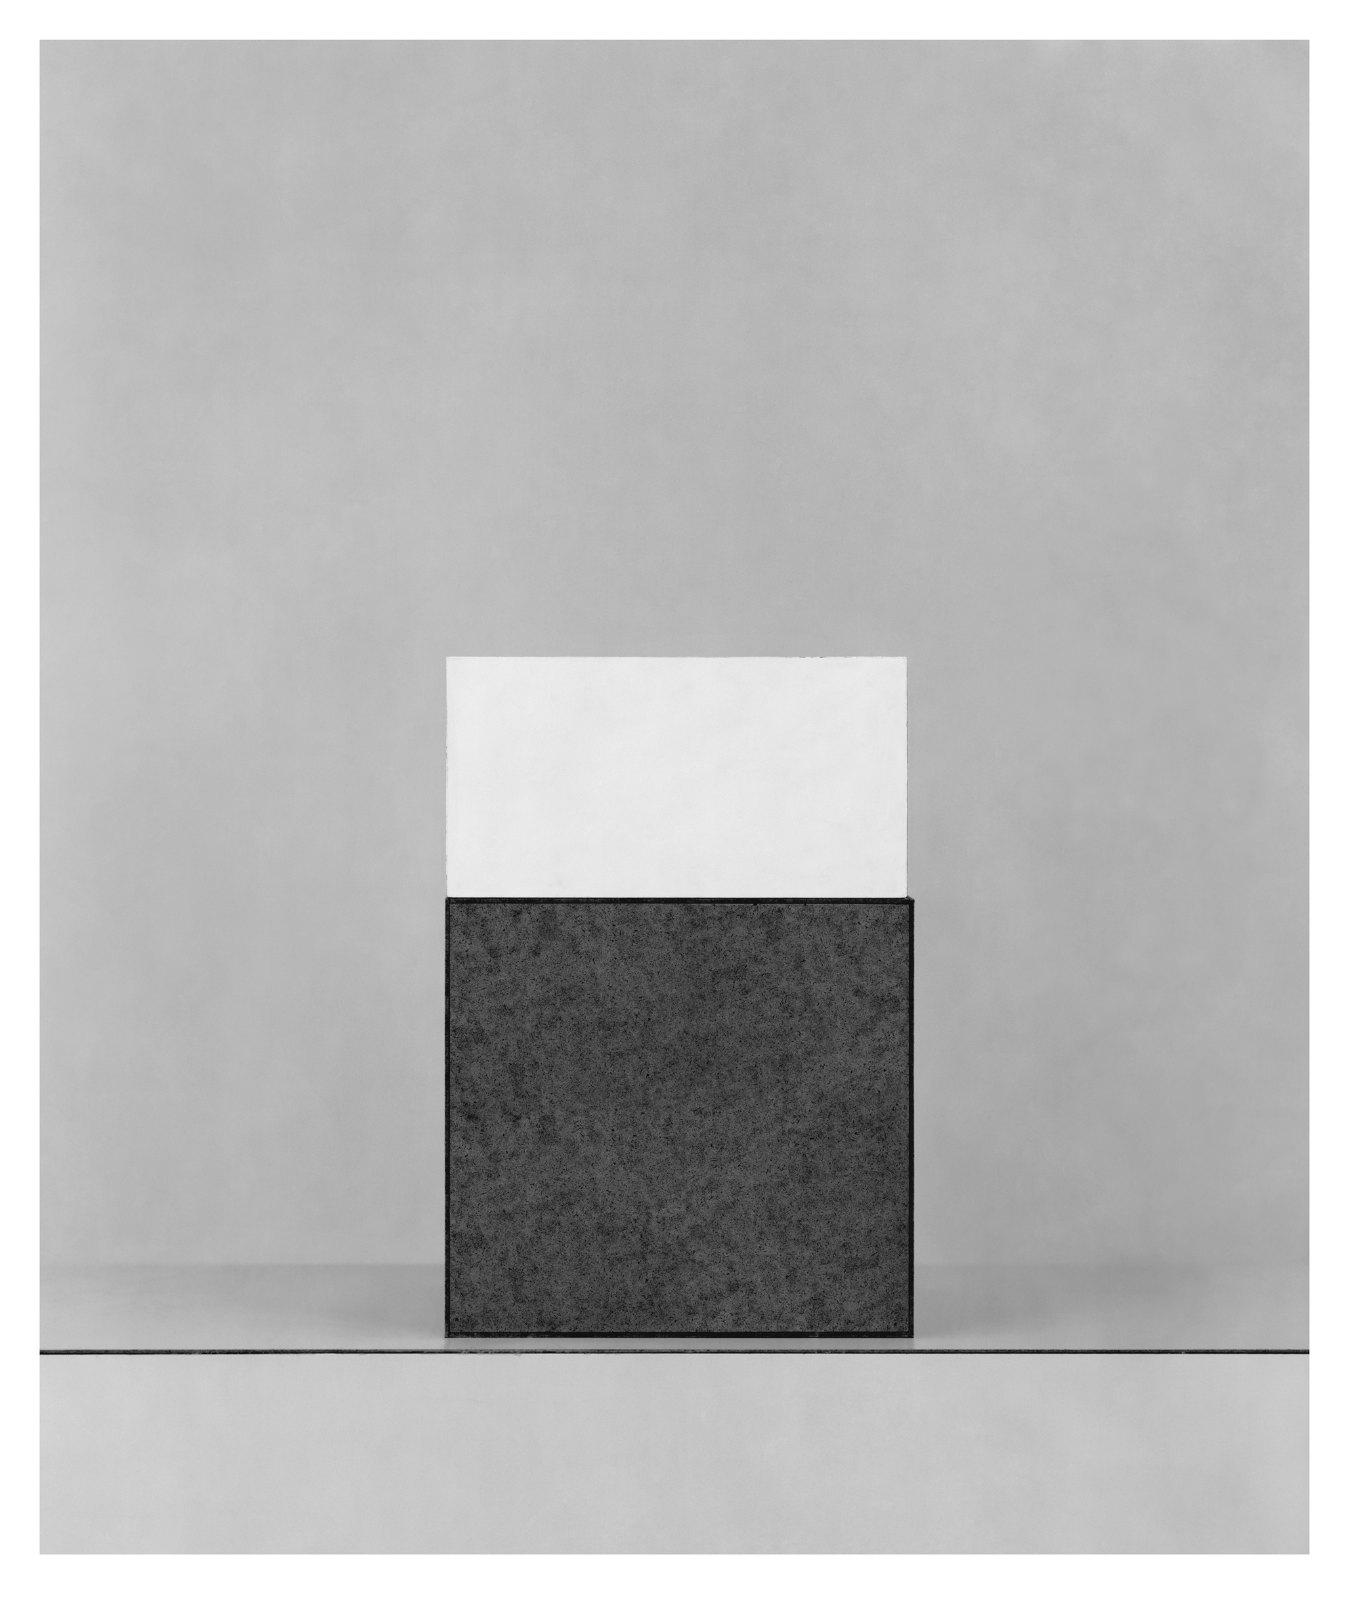 Austiére III, 2012, giclée print on Wandflies on aluminium, 100 x 84 cm